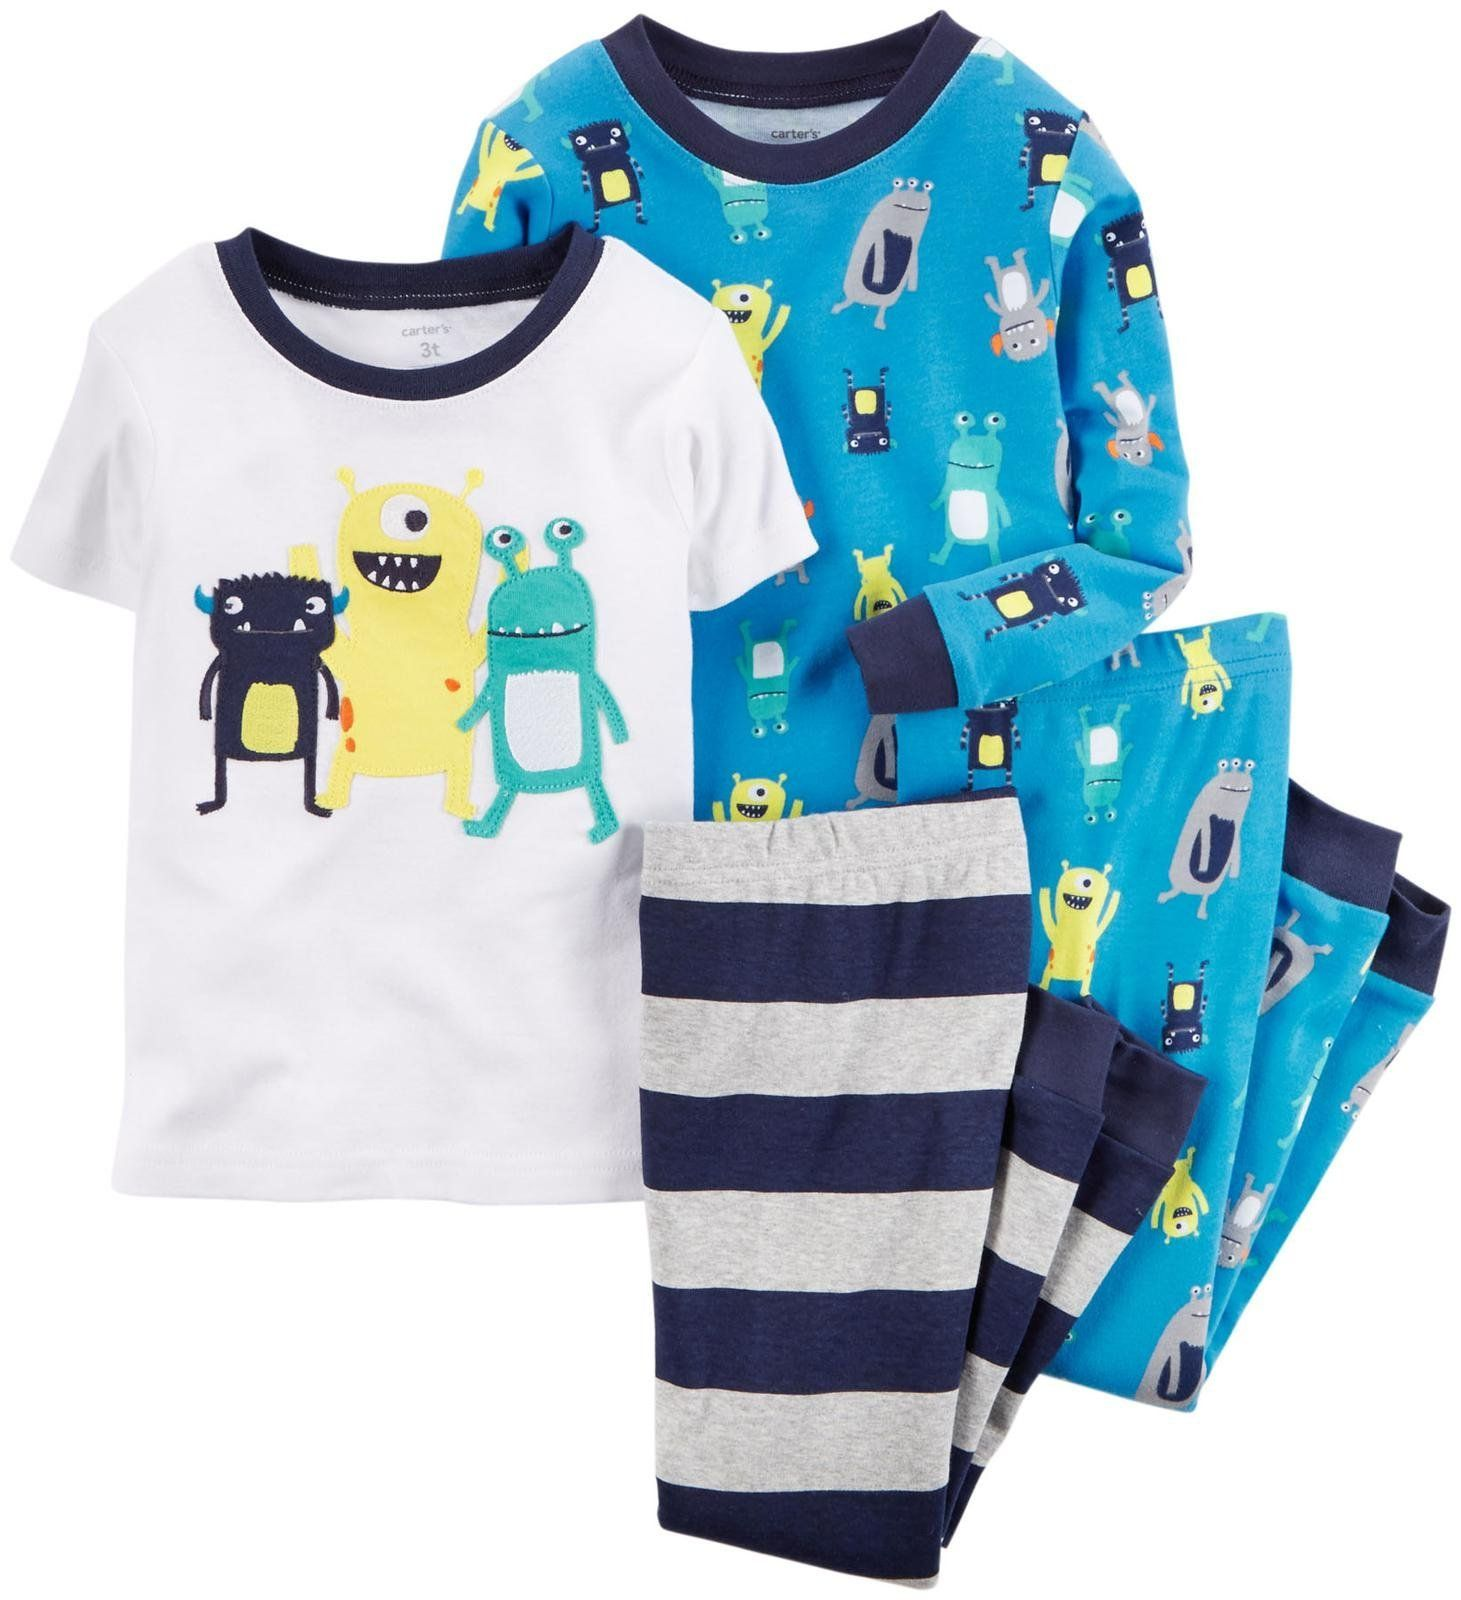 Baby Carters Baby Boys 4 Piece PJ Set